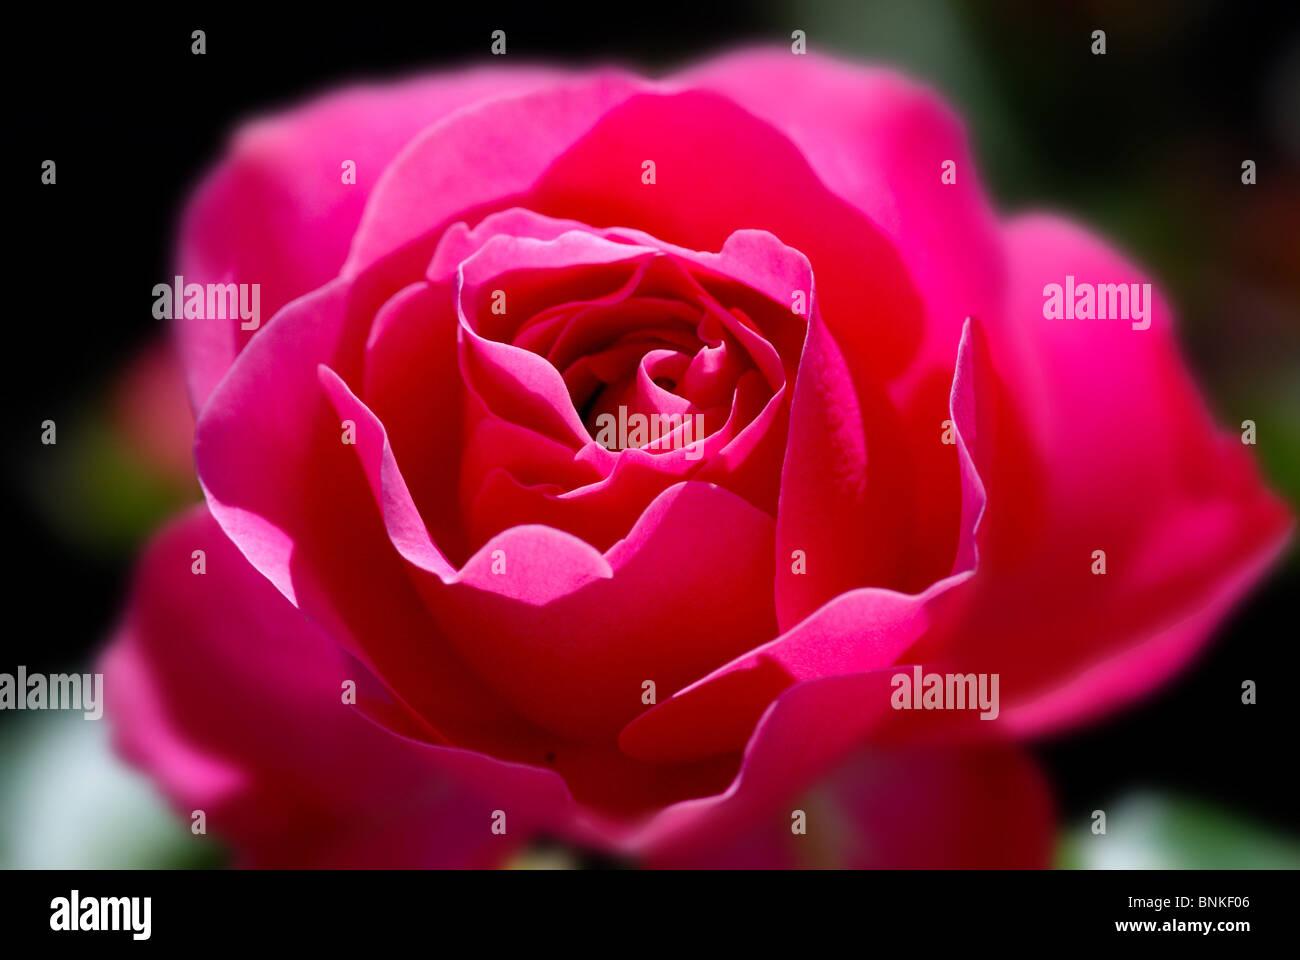 Rose Pink Red Pink Color Flower Plant Blossom Flourish Petals Nature